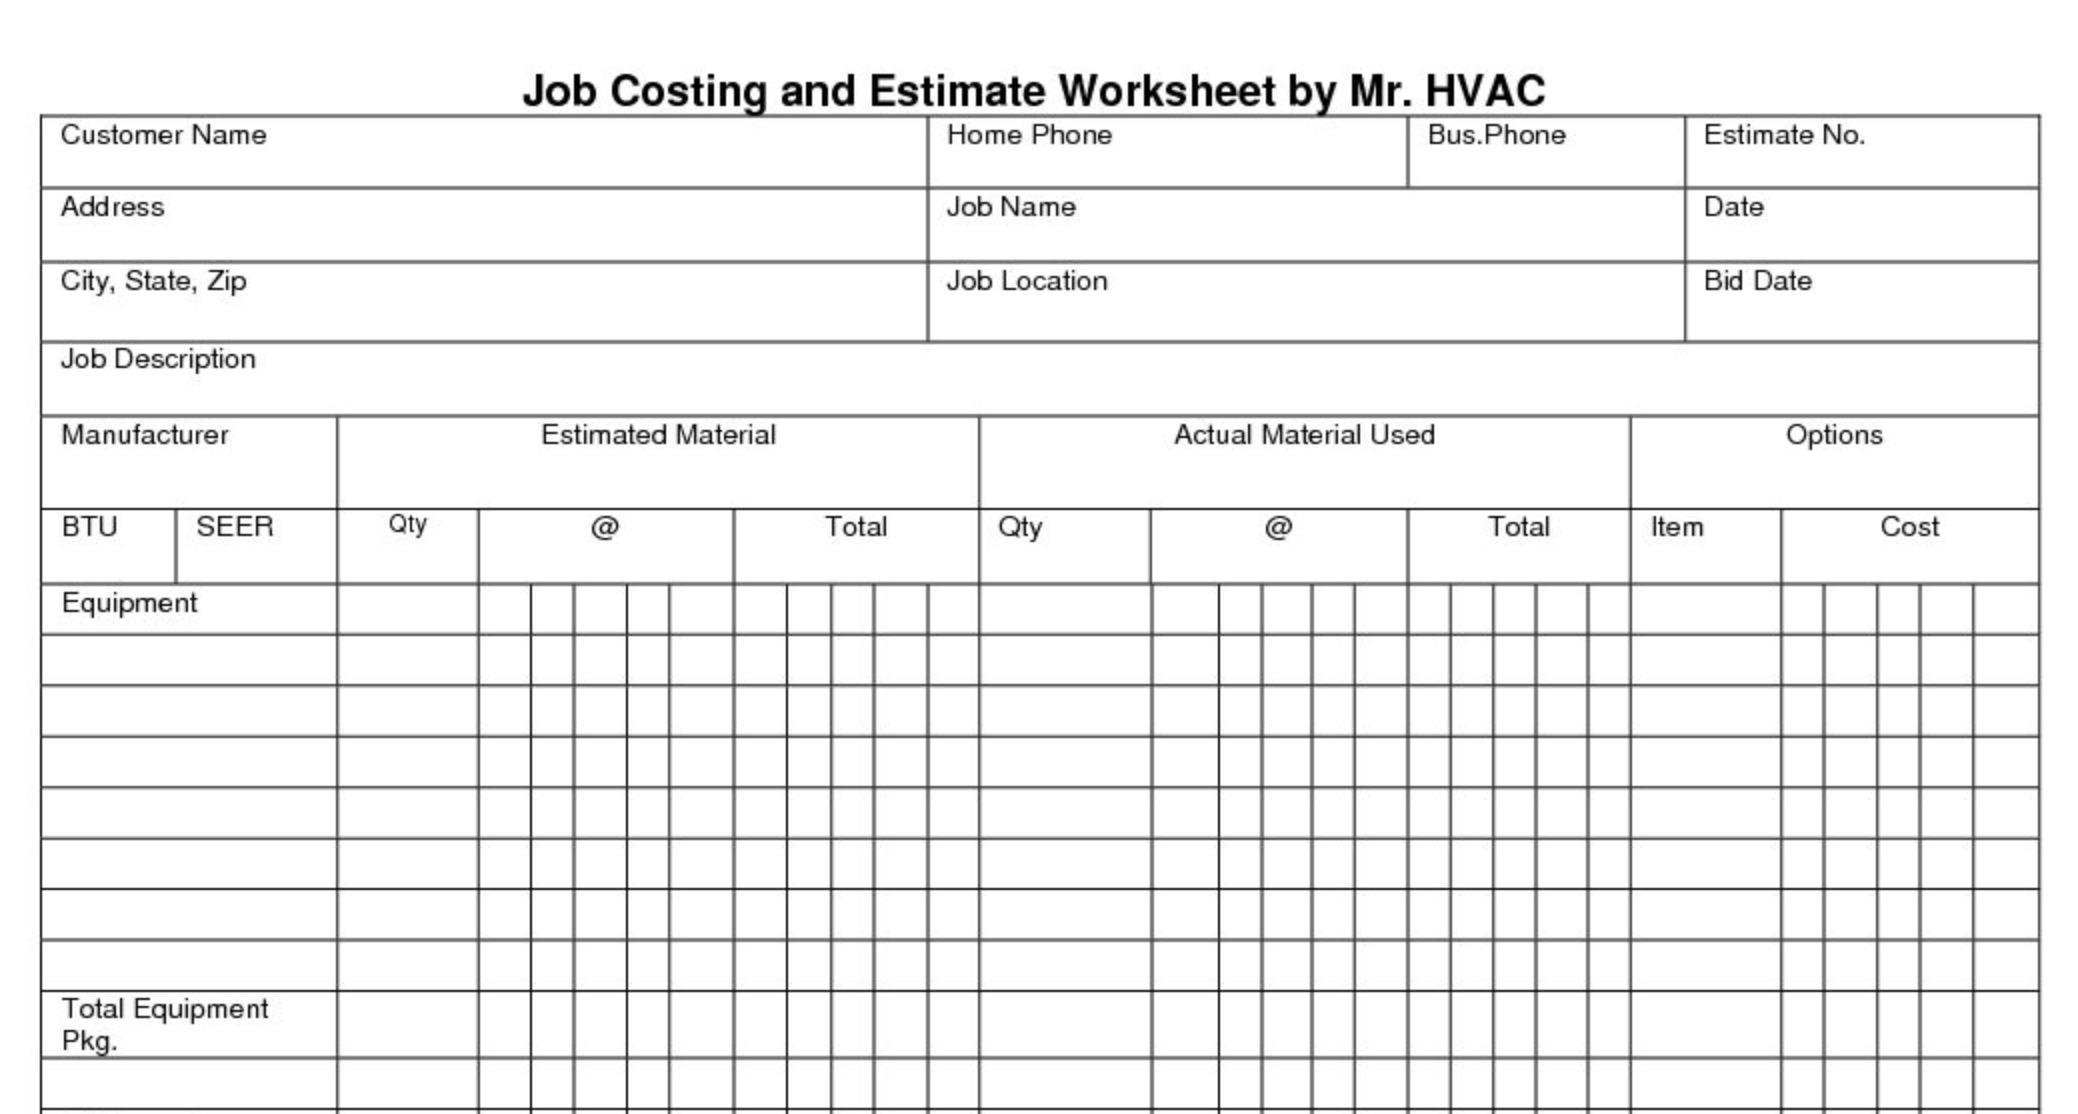 Job Costing And Estimate Worksheet Mr Hvac